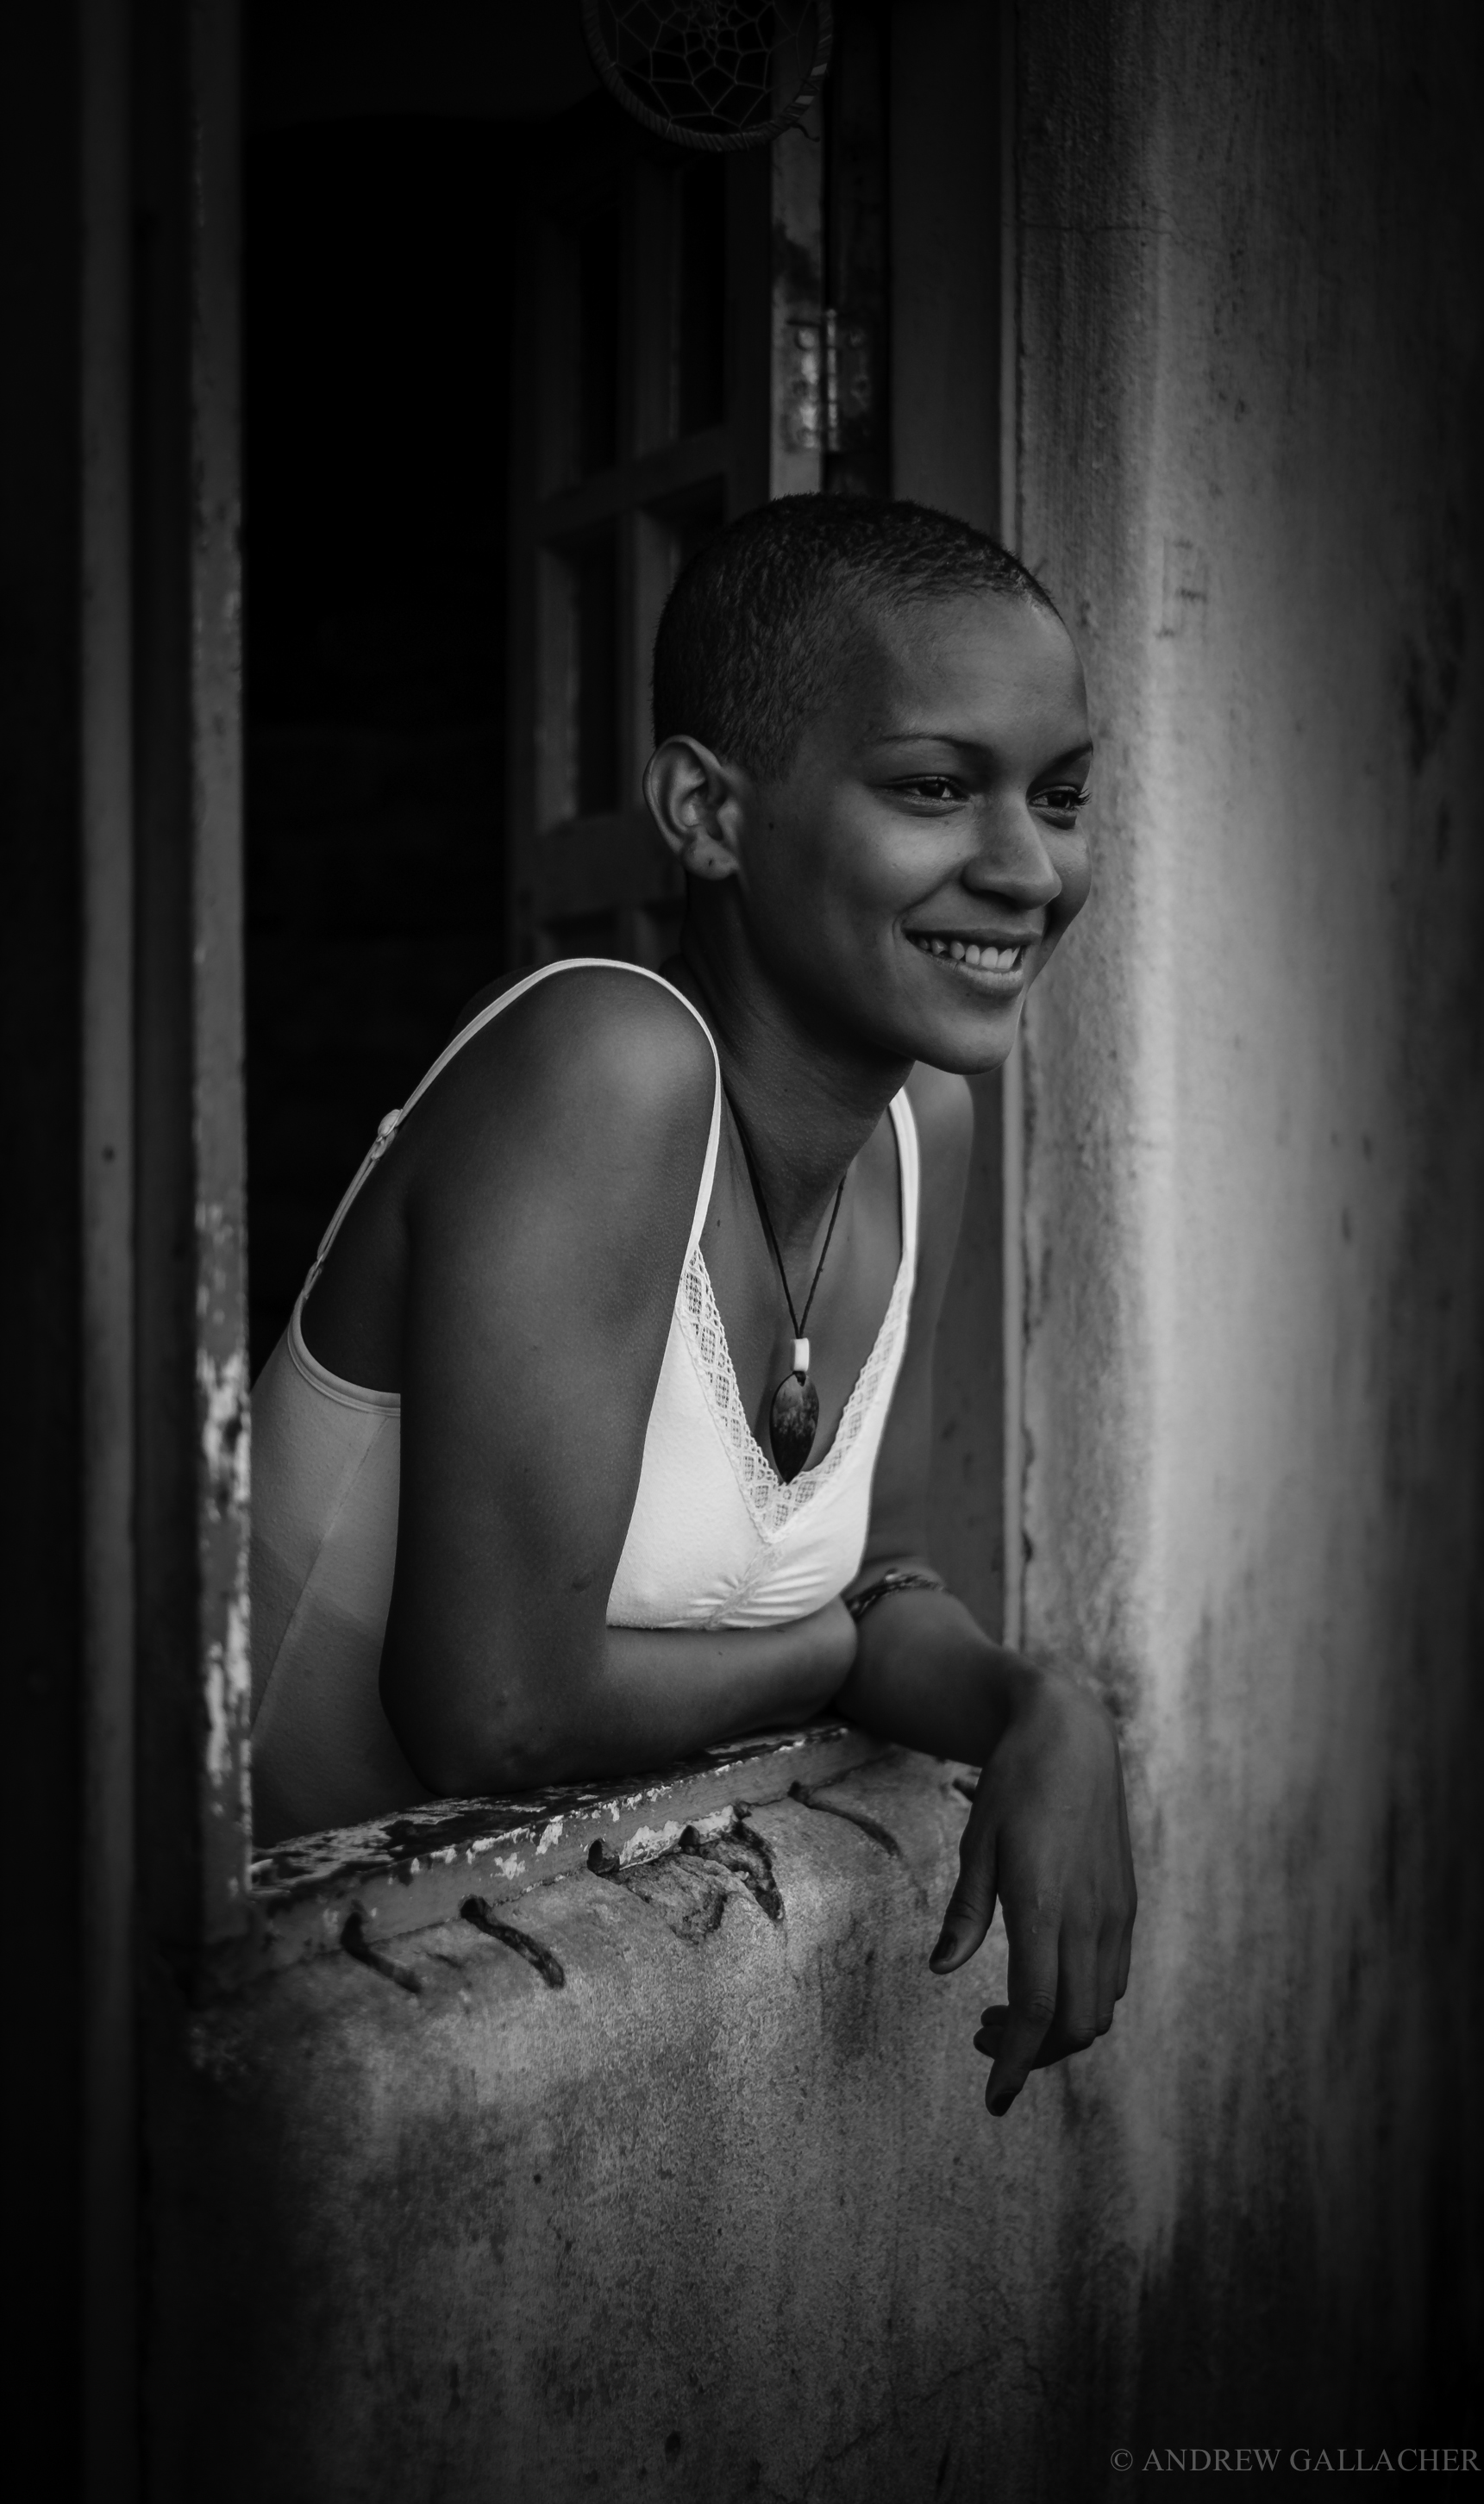 Favella girl, Brazil